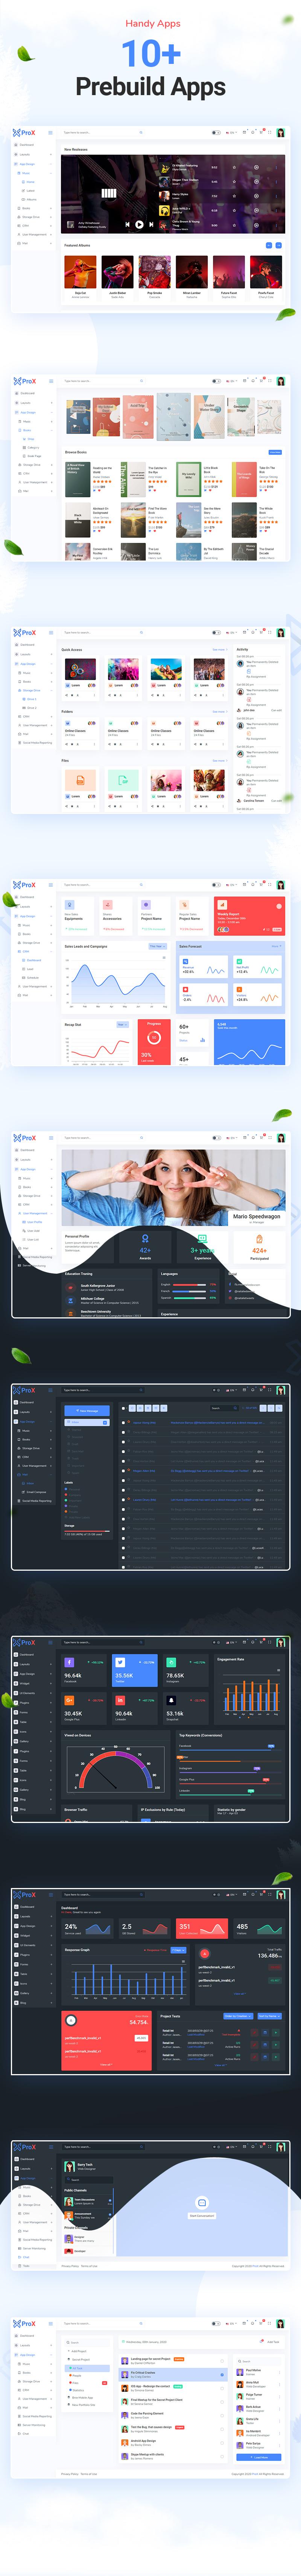 ProX - Multipurpose VueJS, HTML, SCSS Admin Template + Landing Pages - 12